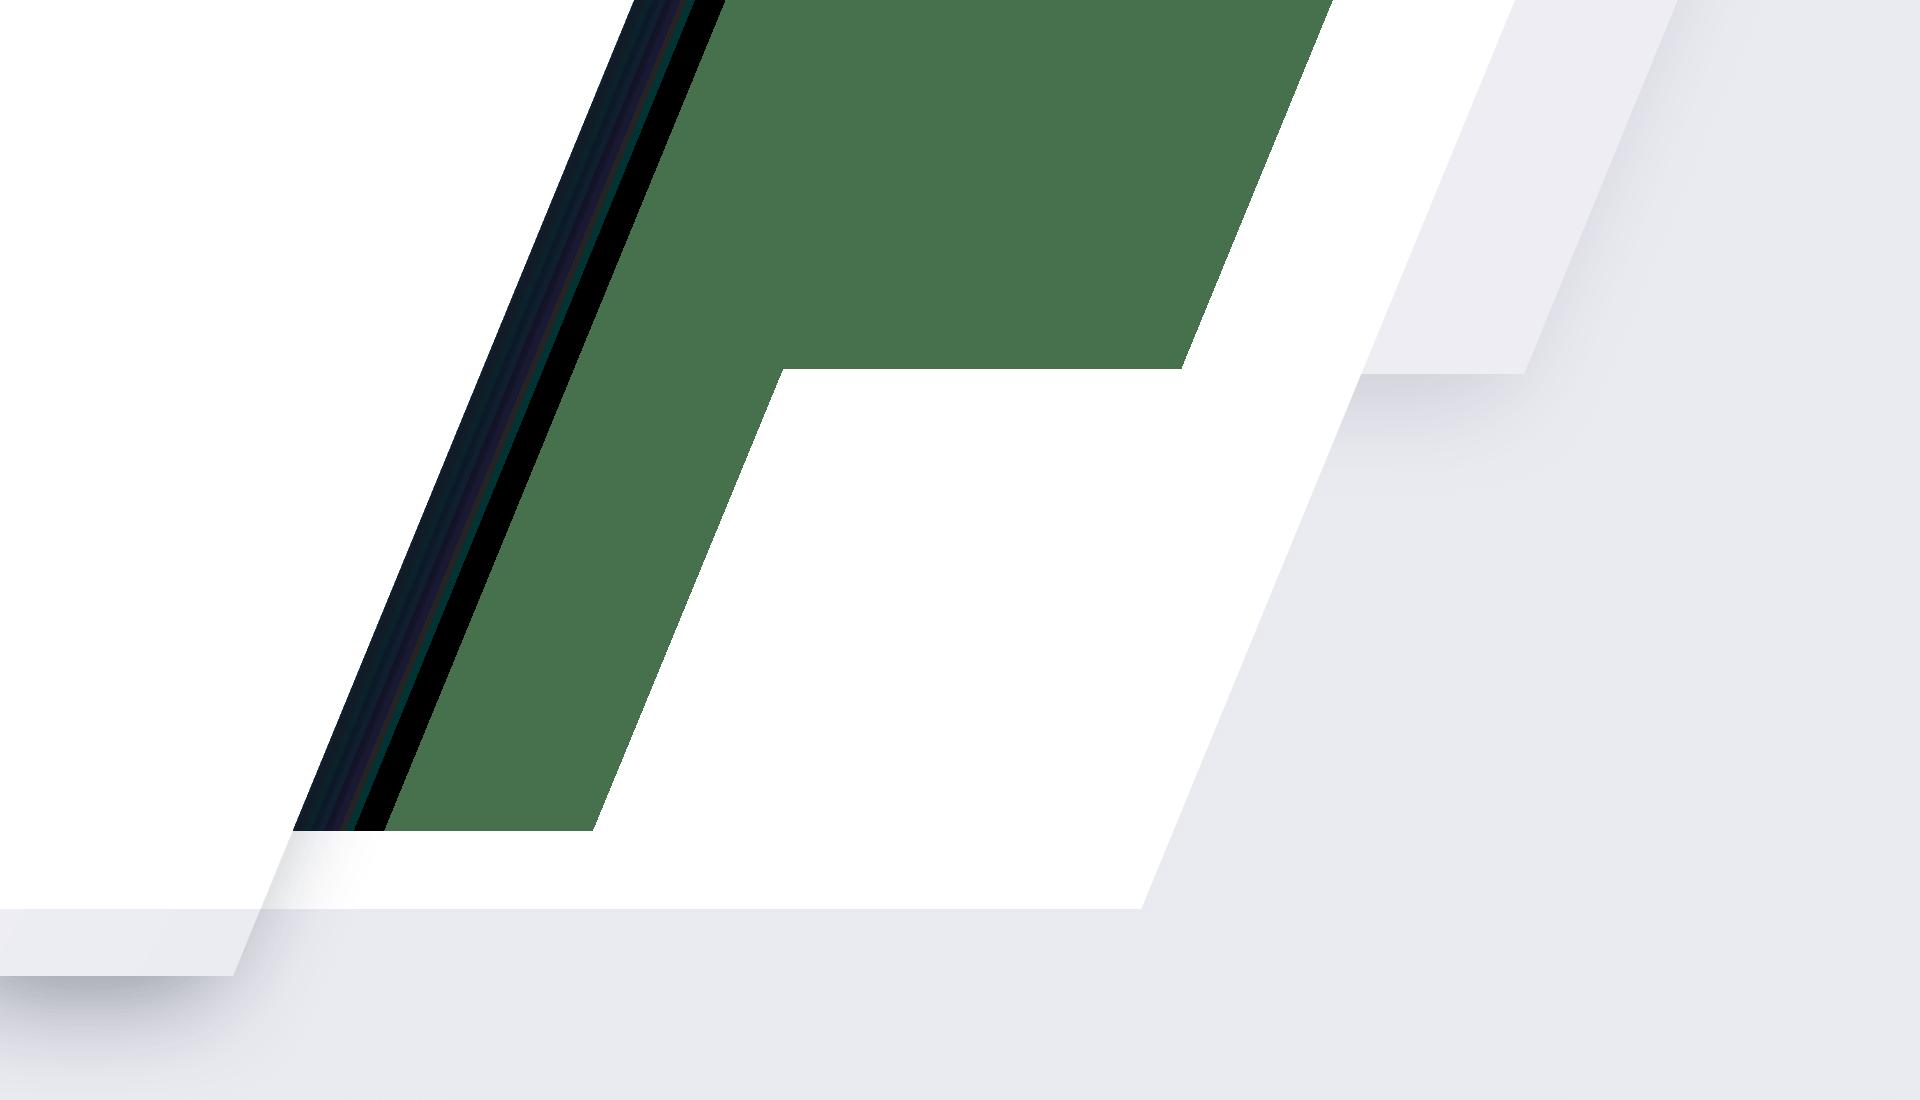 EDGE 912 STI